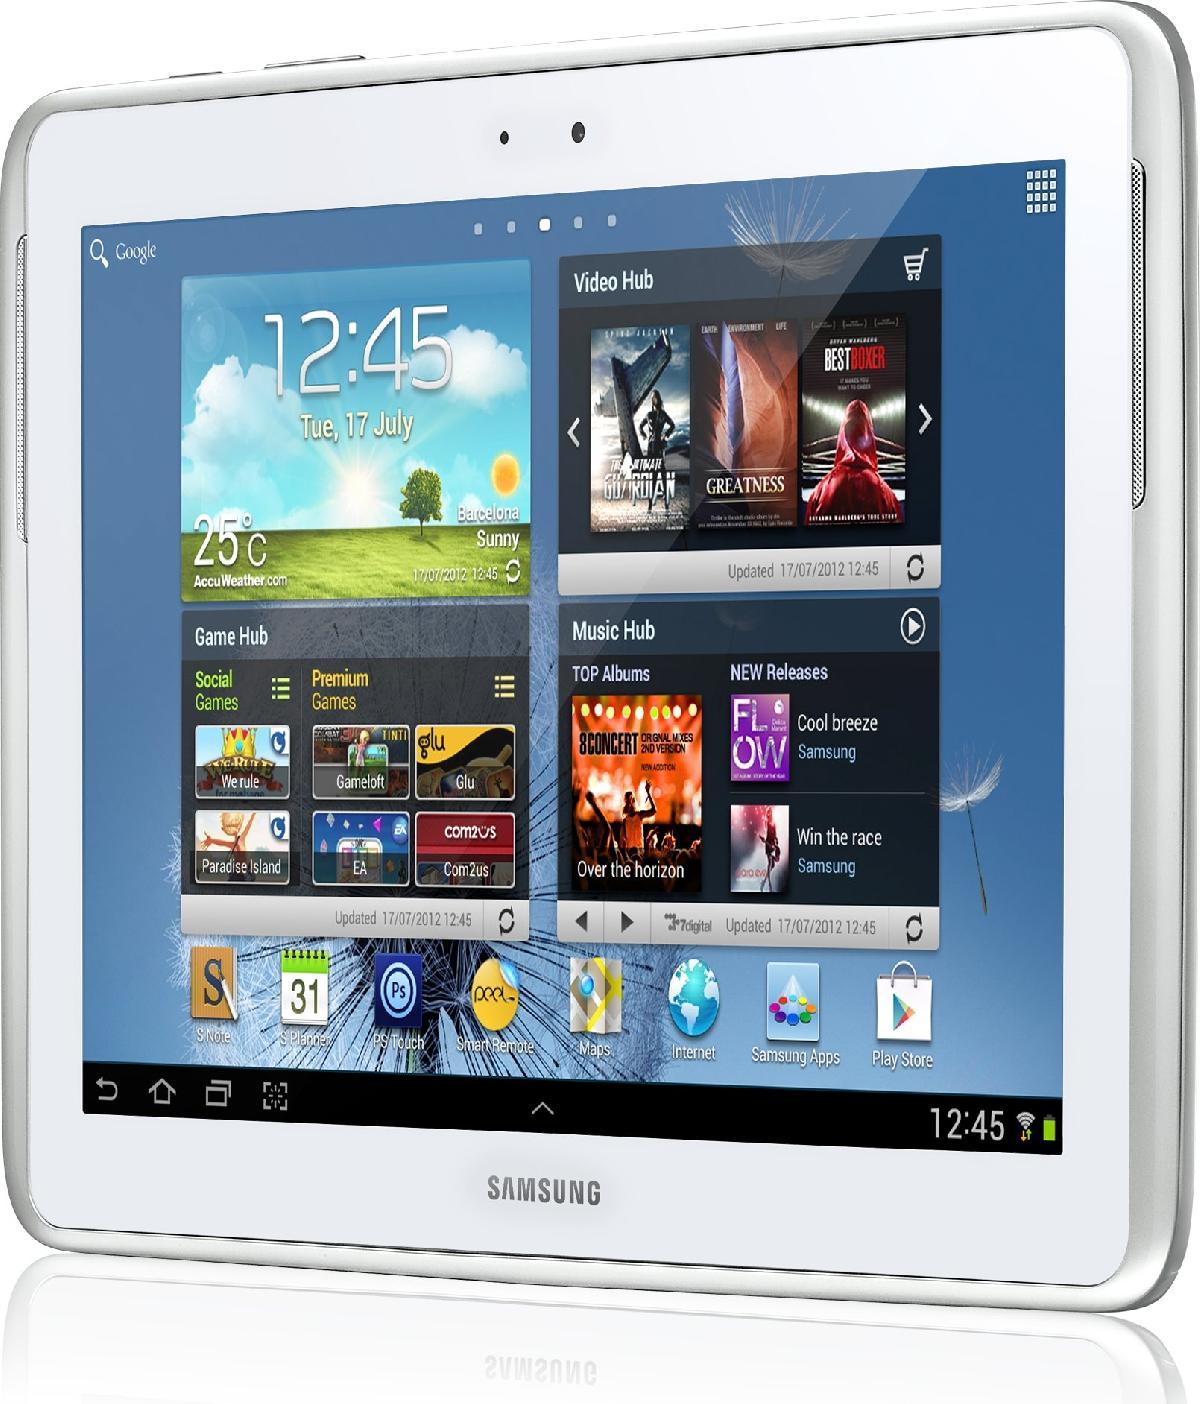 Galaxy Note 10.1 (WiFi) GT-N8010